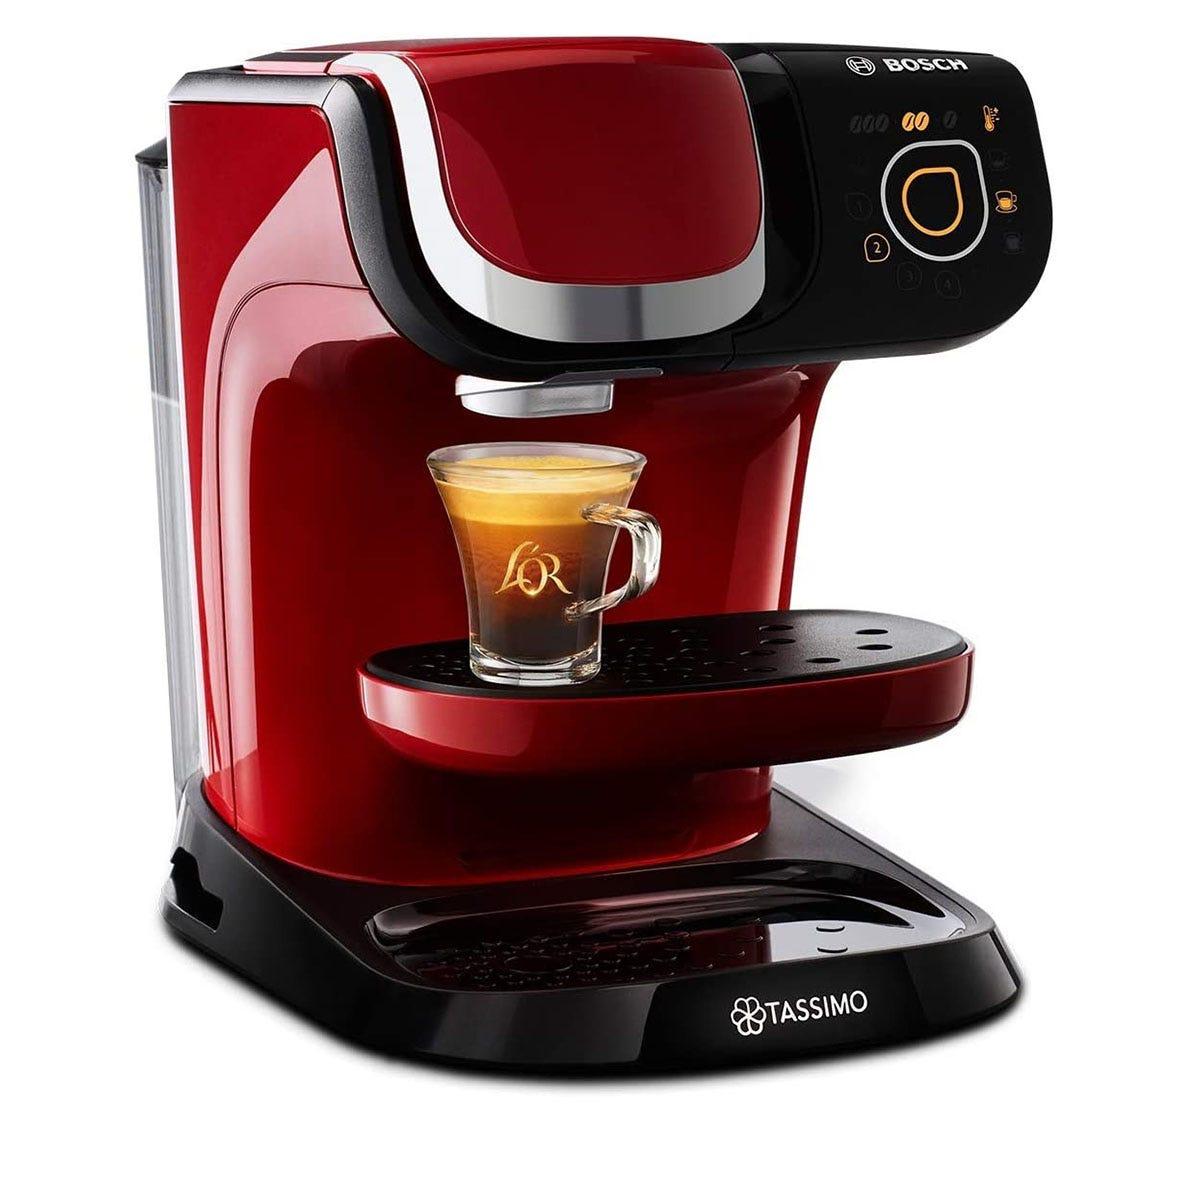 Tassimo by Bosch TAS6503GB My Way 2 Pod Coffee Machine - Red